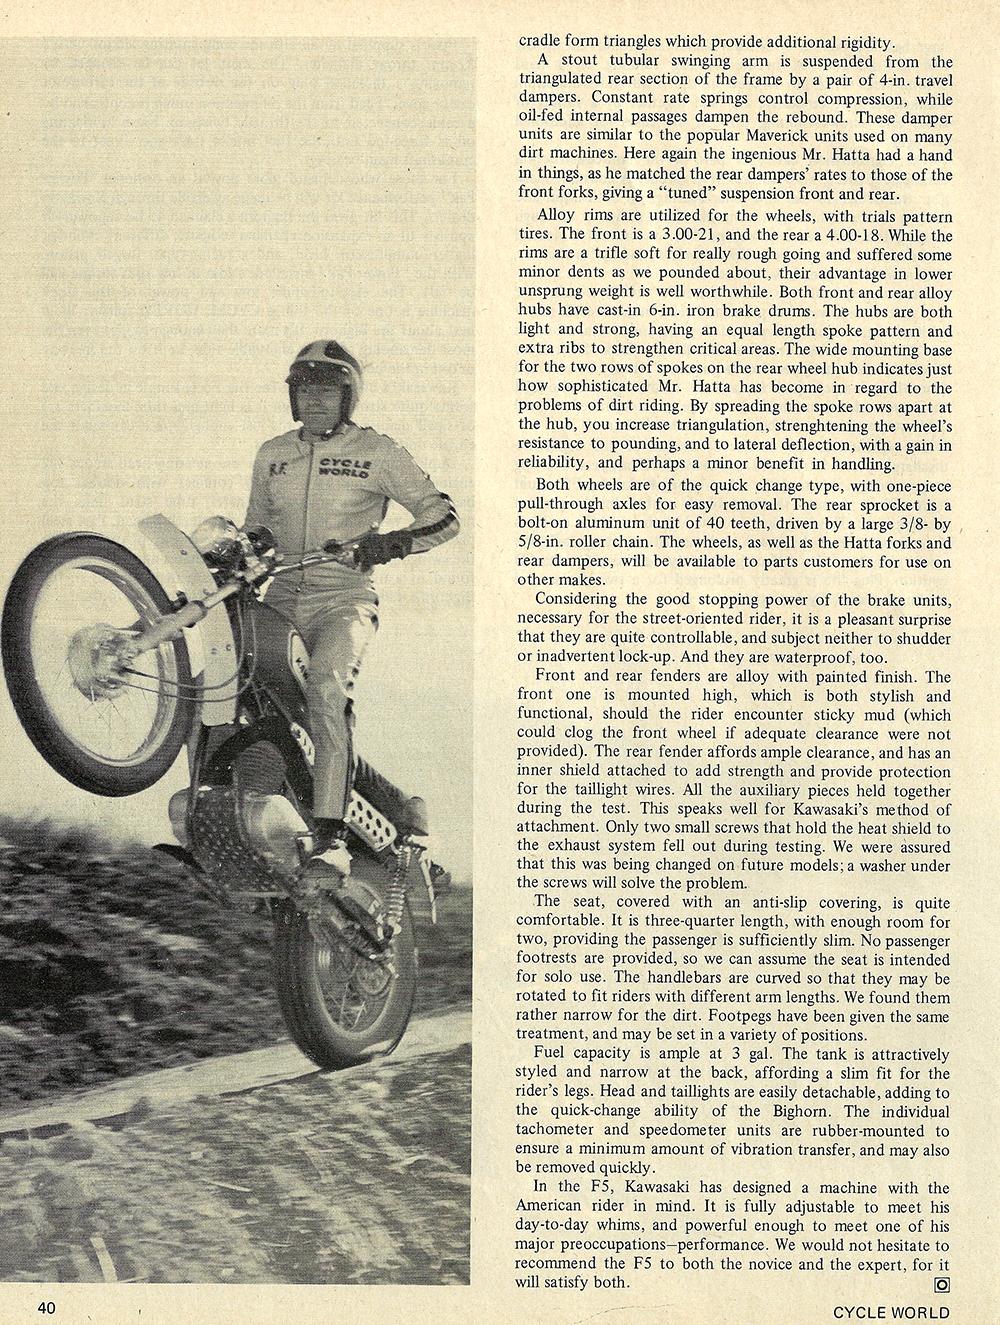 1970 Kawasaki F5 Bighorn road test 05.jpg